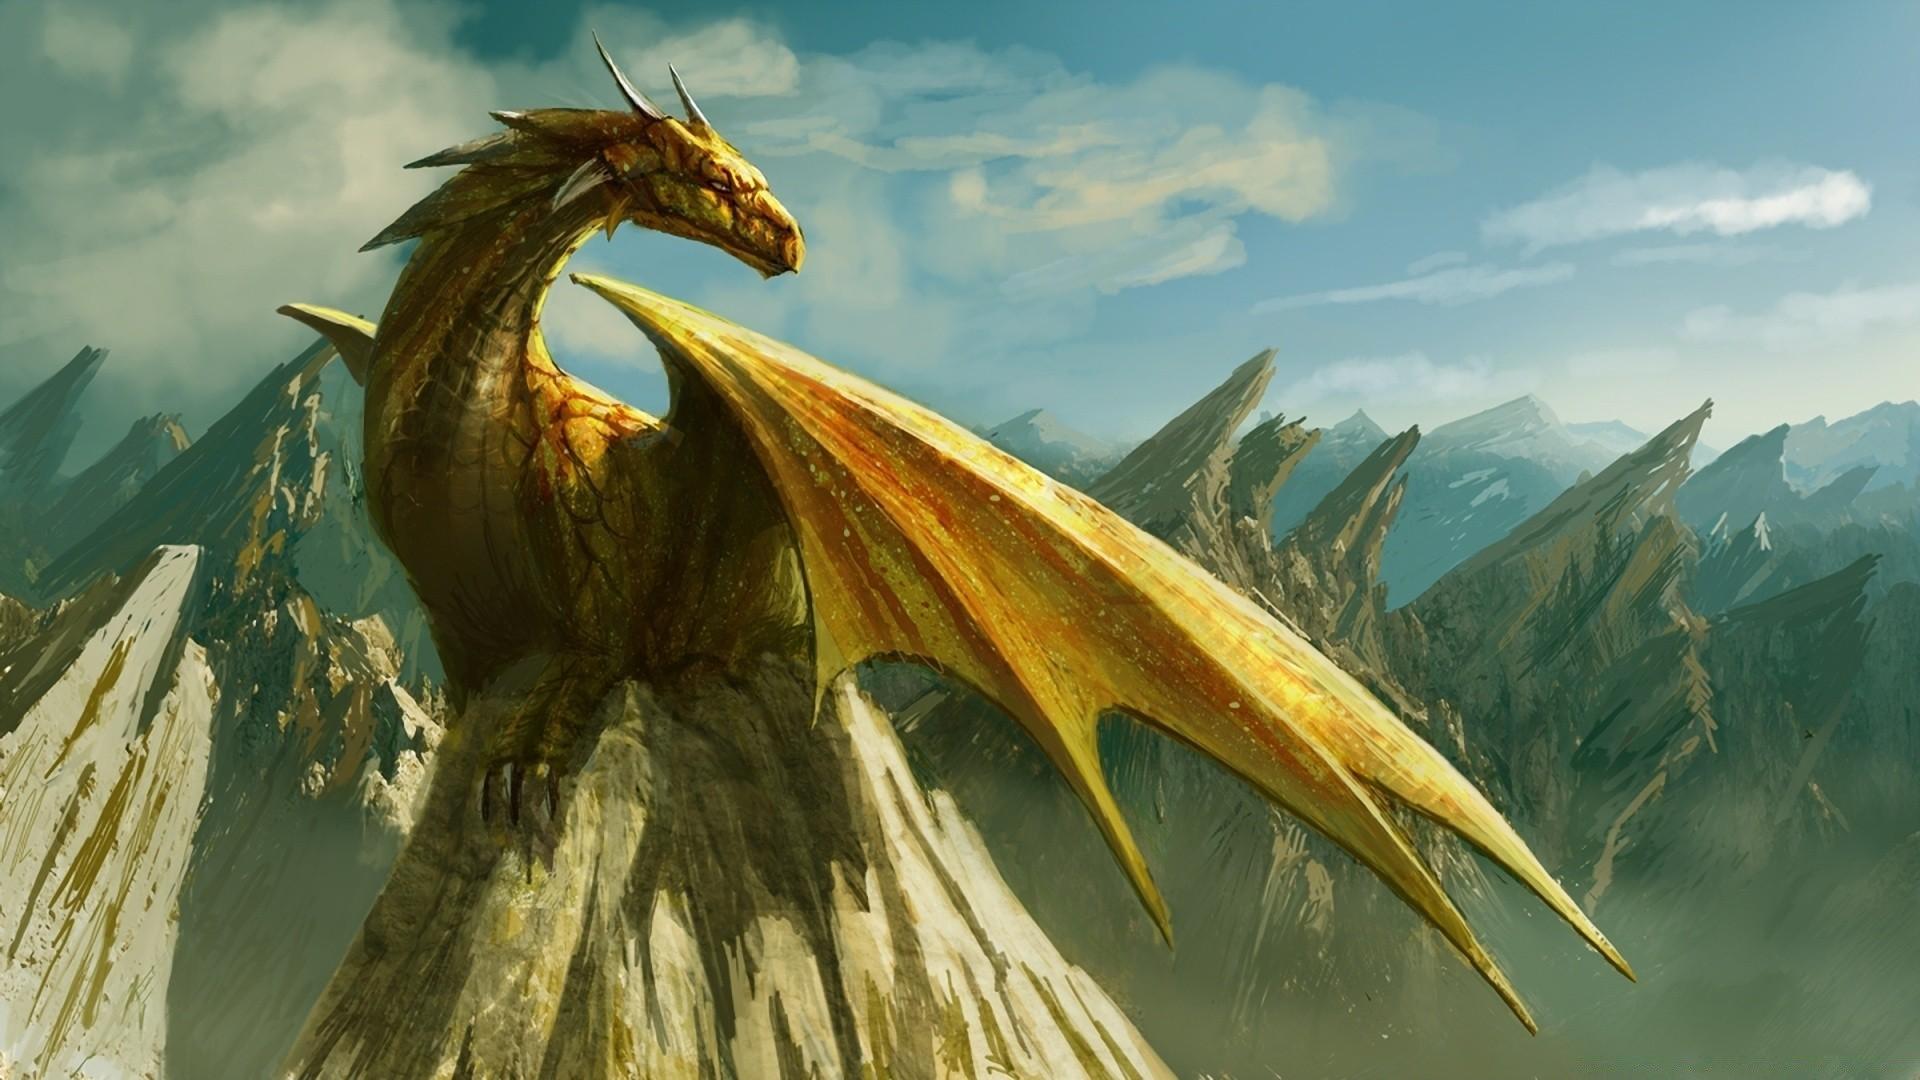 Картинки про драконов на ютубе уперлась его